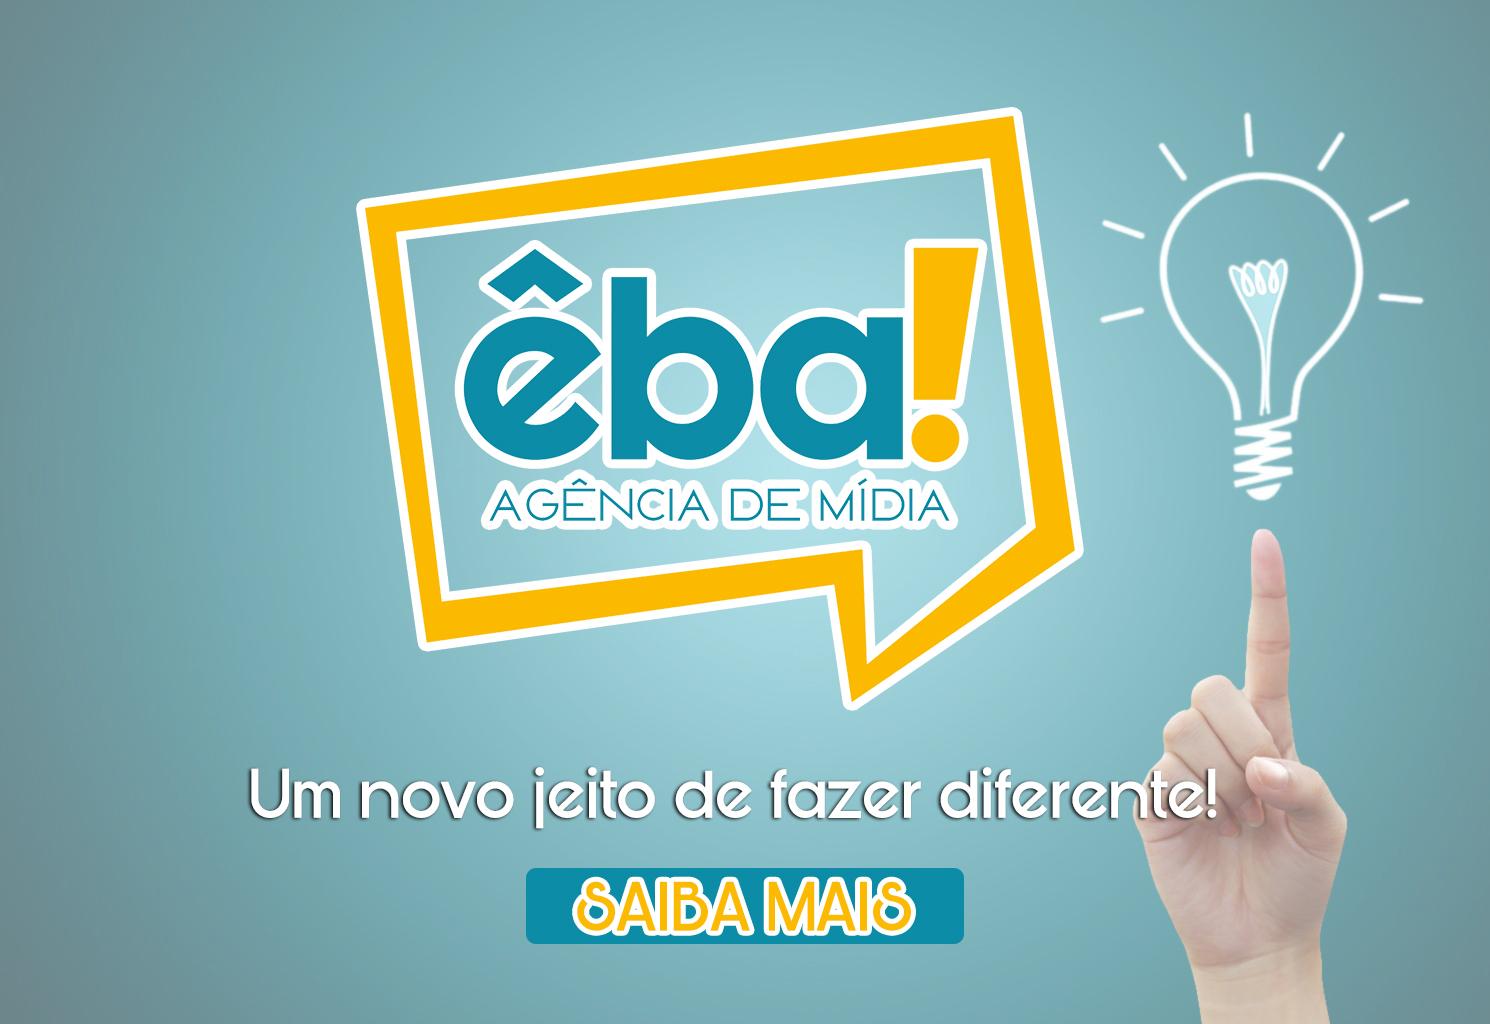 Êba! Agência de Mídia